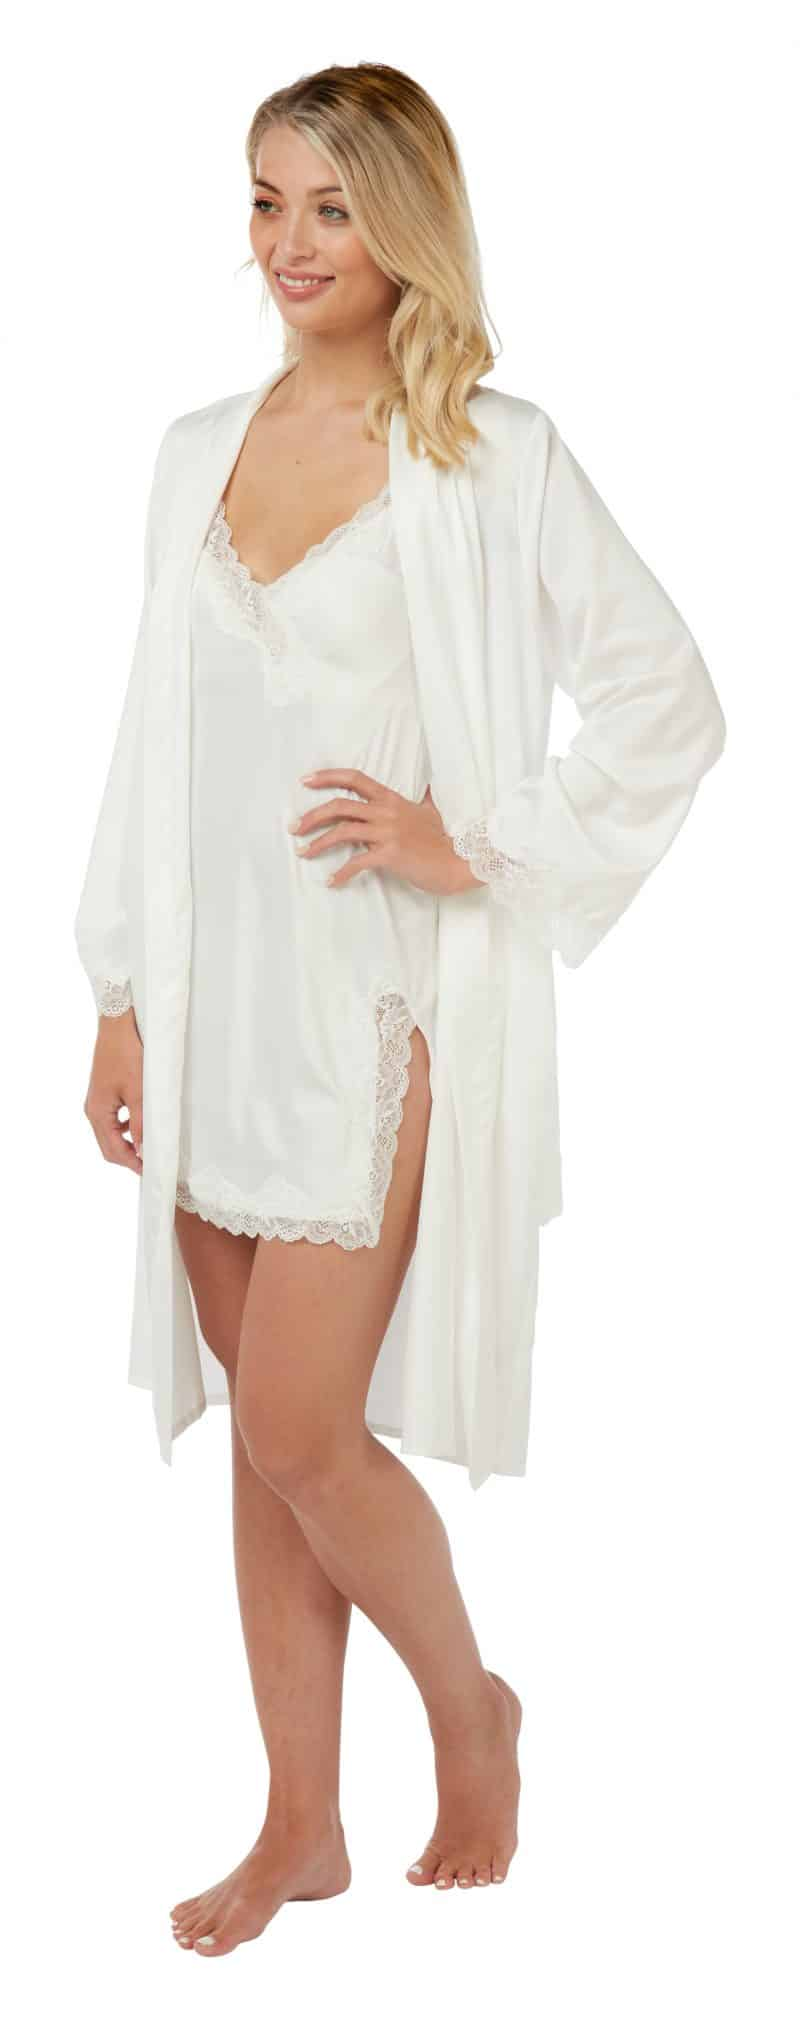 Satin Lace Nightwear Set Indigo Sky Ivory